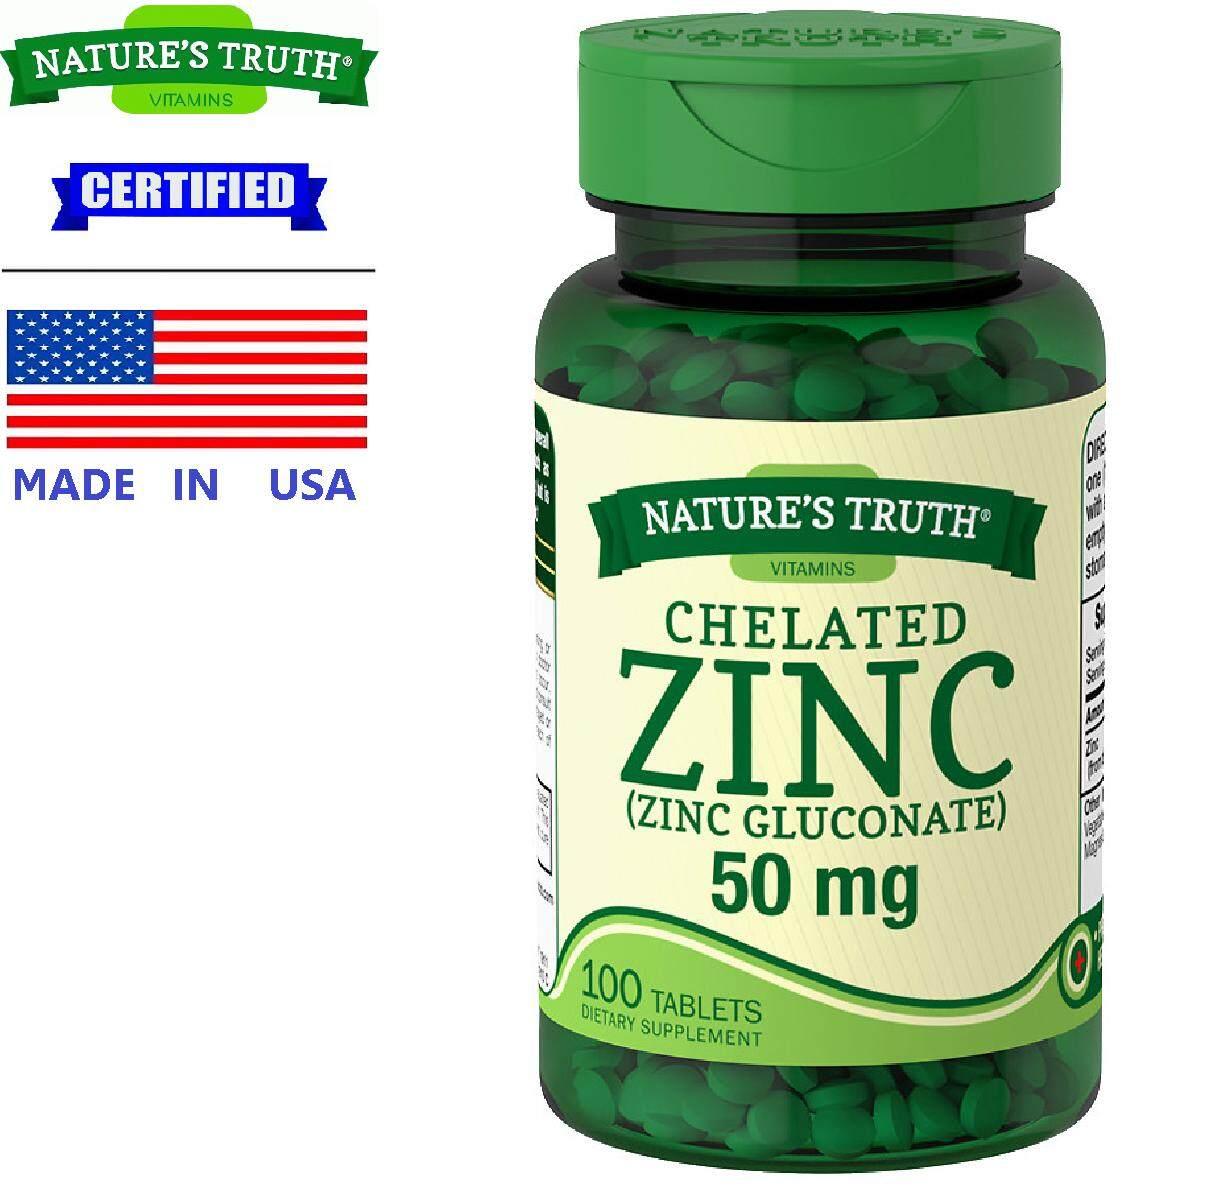 Nature's Truth Zinc 50 mg x 100 เม็ด เนเจอร์ ทรูทร์ สังกะสี ซิงค์ / กินพร้อม เอแอลเอ แอสต้าแซนทีน ไบโอติน คอลลาเจน โคคิวเทน เมล็ดองุ่นสกัด กลูต้า มาคา วิตามินซี อี /